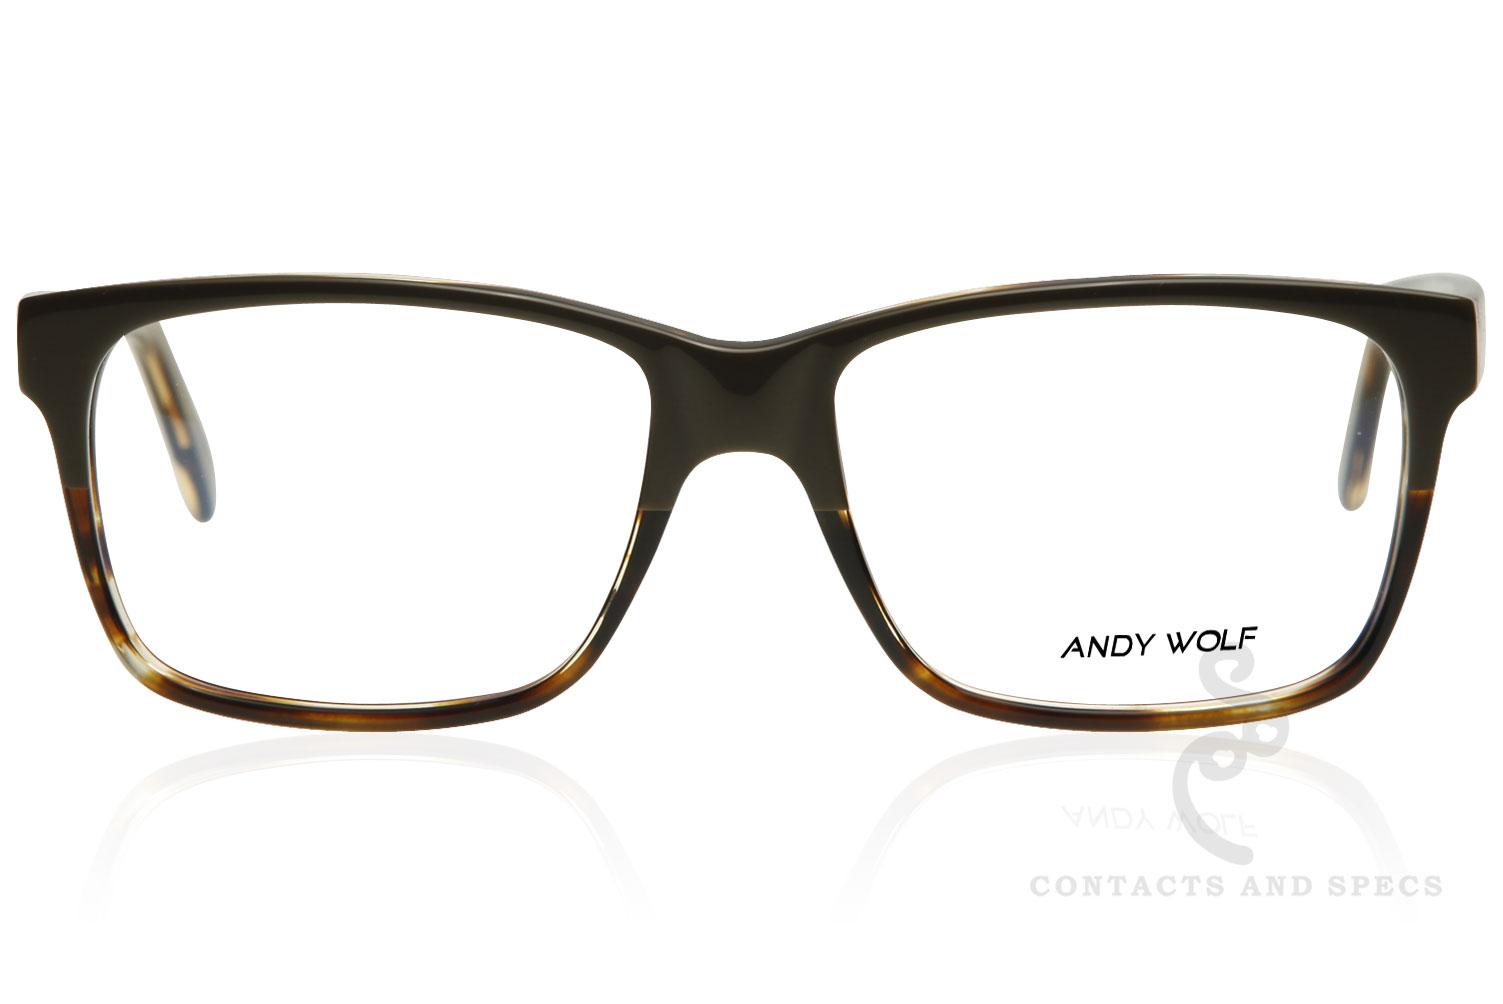 Andy Wolf Eyewear 4499